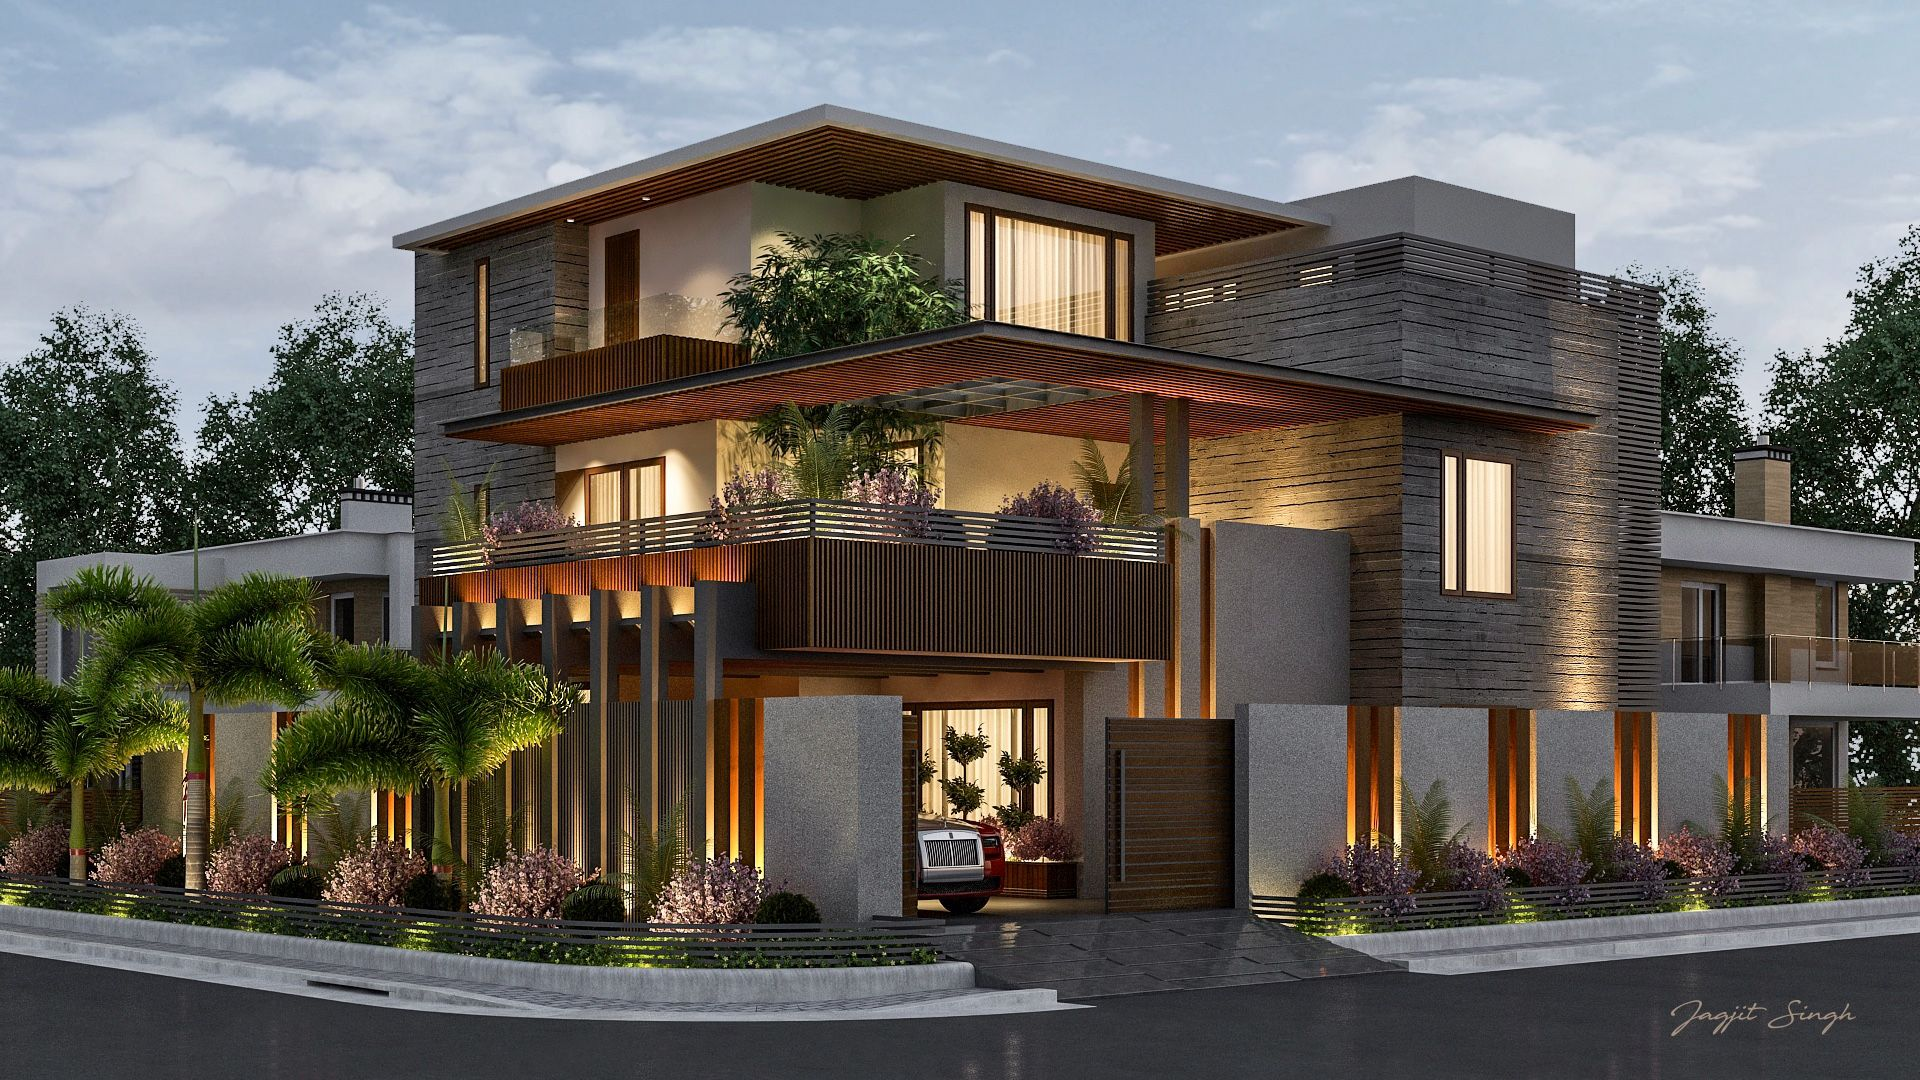 Hausfrontdesign in rajasthan house designed for client at jodhpur rajasthan  rumah modern